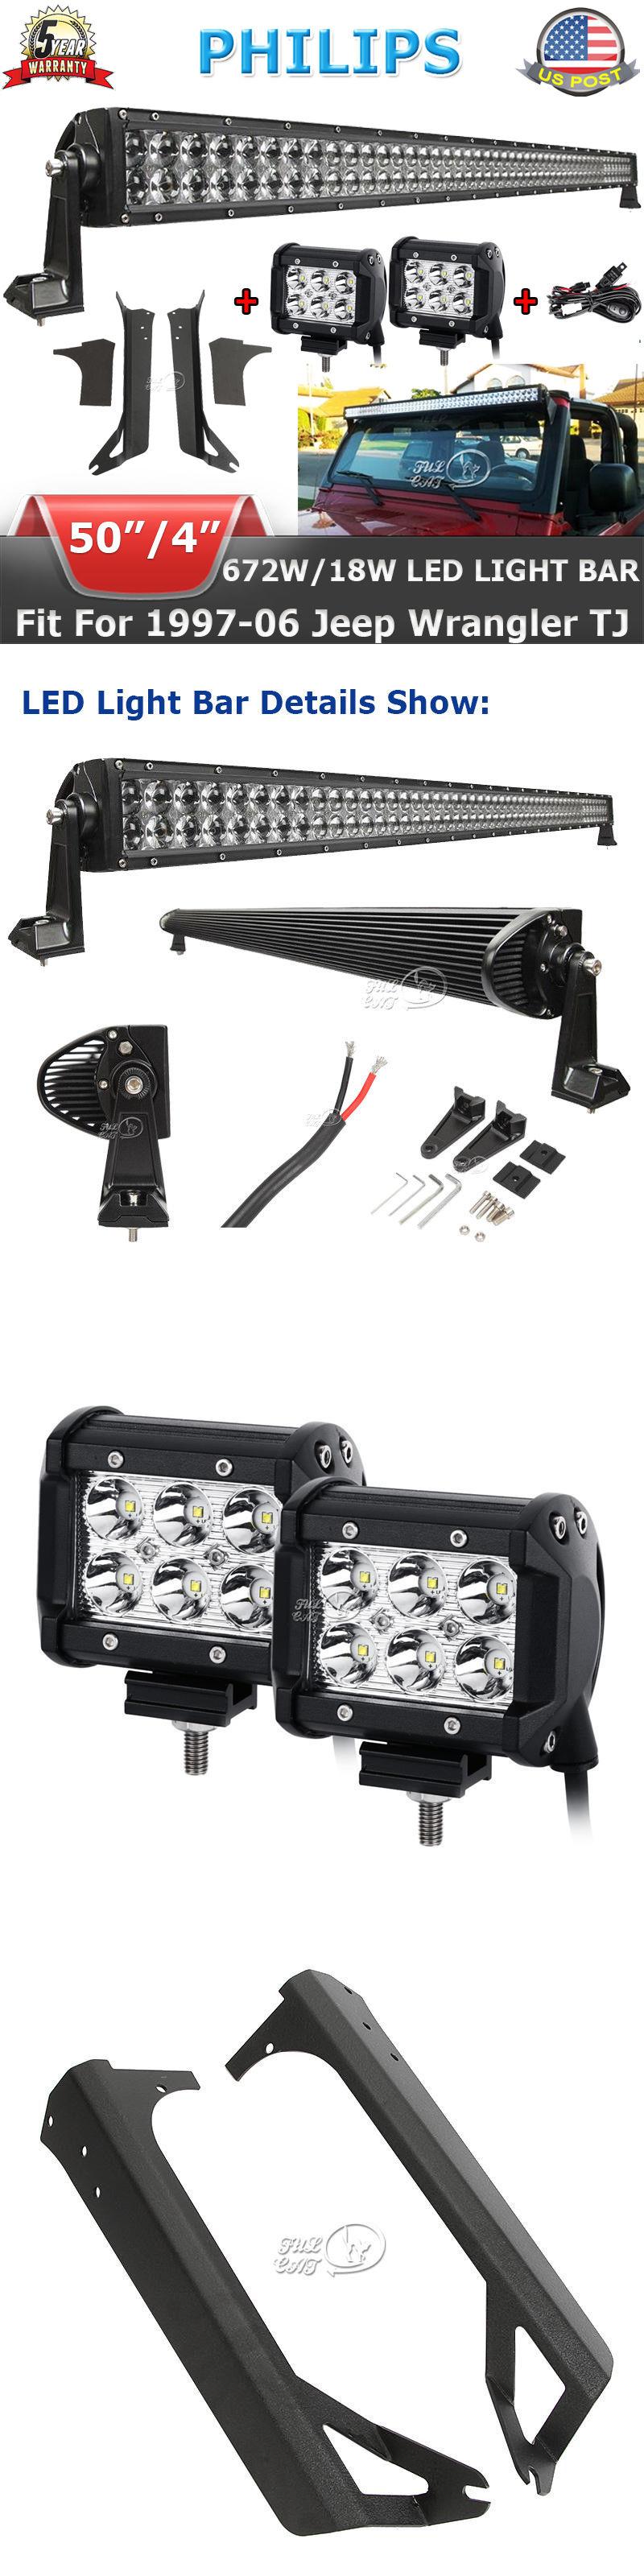 Car Lighting 50inch 18w Led Light Bar Wiring Kit Mount Bracket Fit Jeep Jk